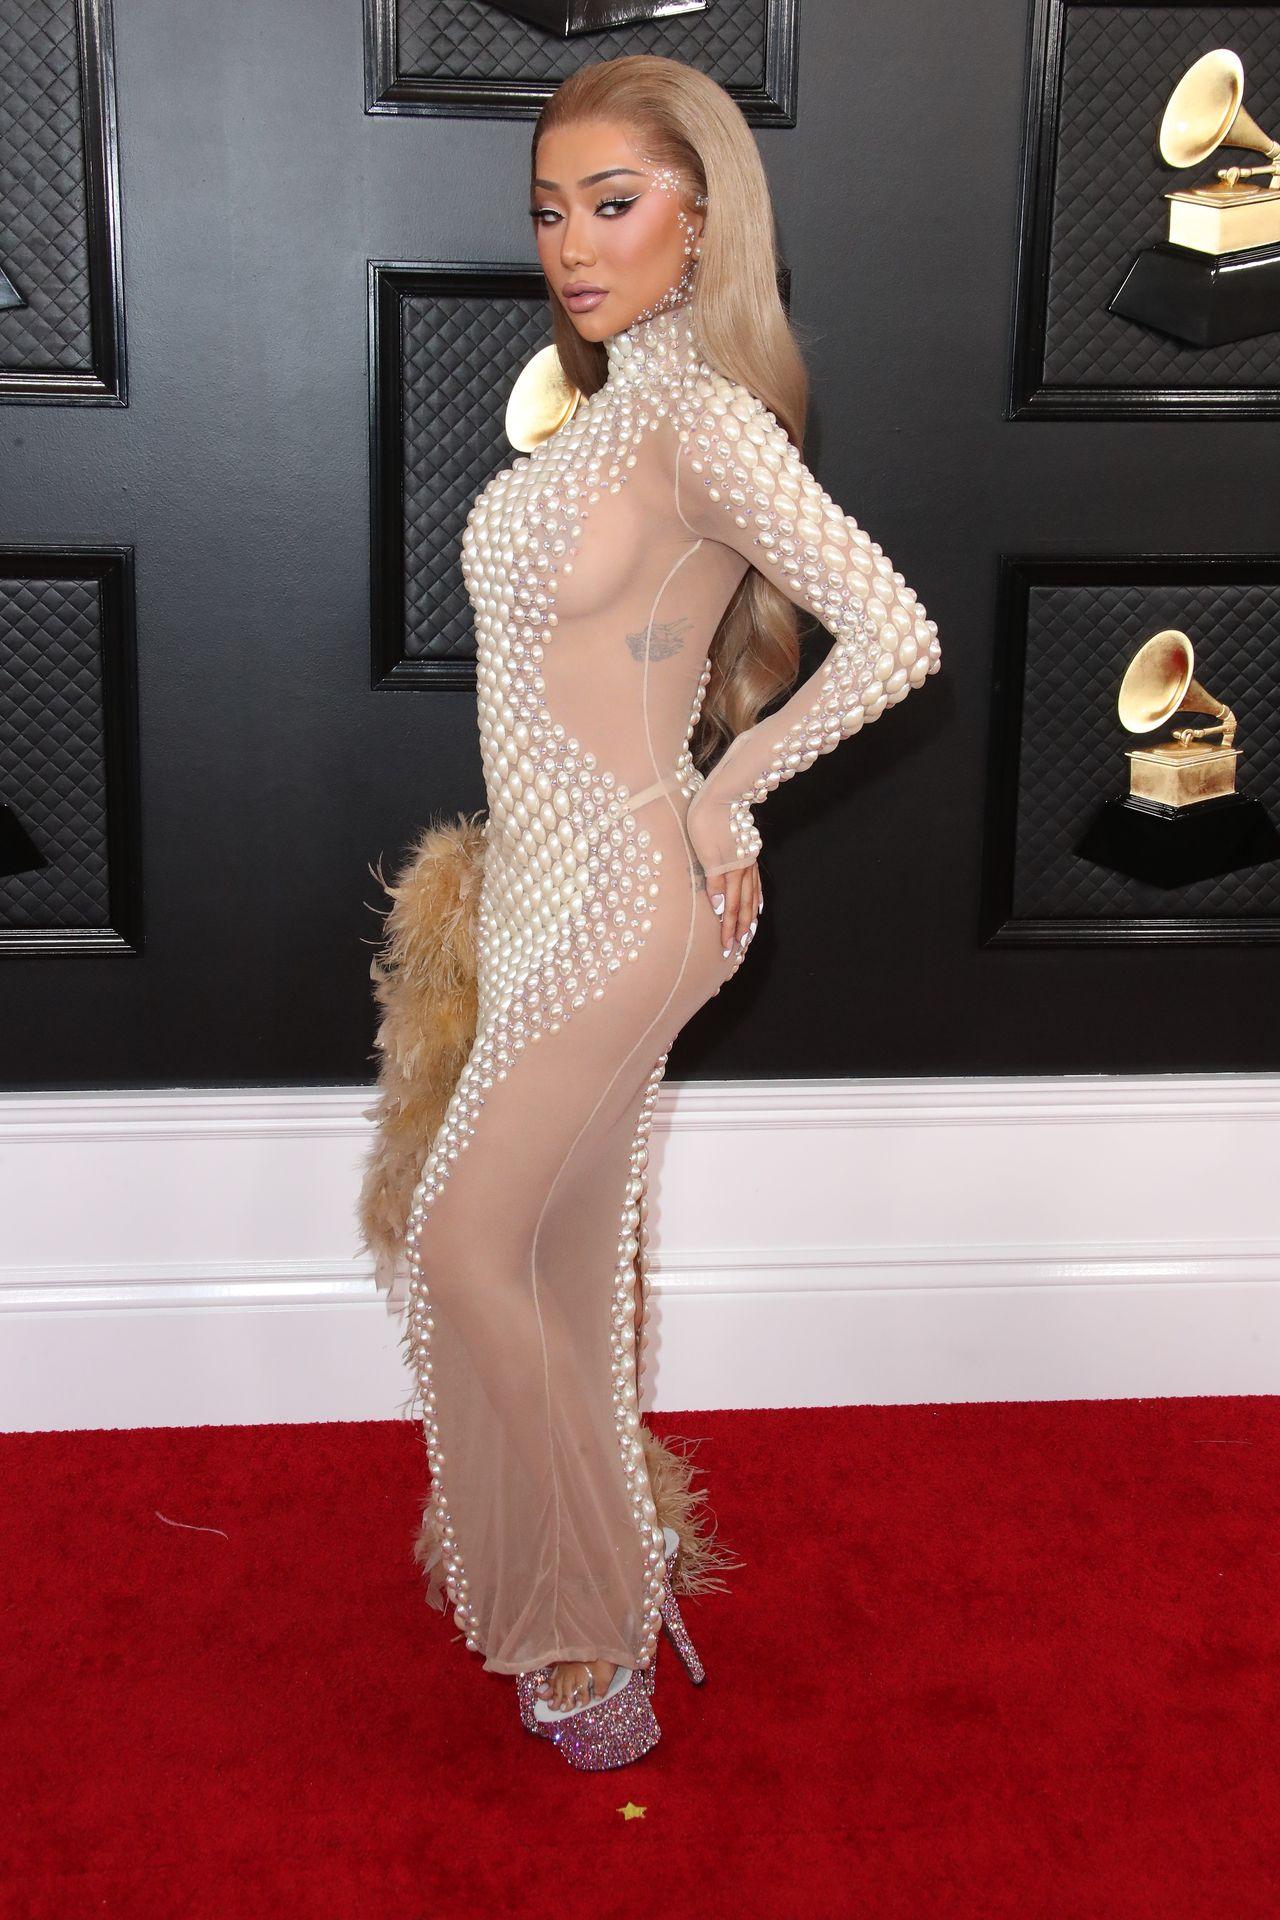 Nikita Dragun Rocks Sheer Dress On The 62nd Annual Grammy Awards Red Carpet 0003